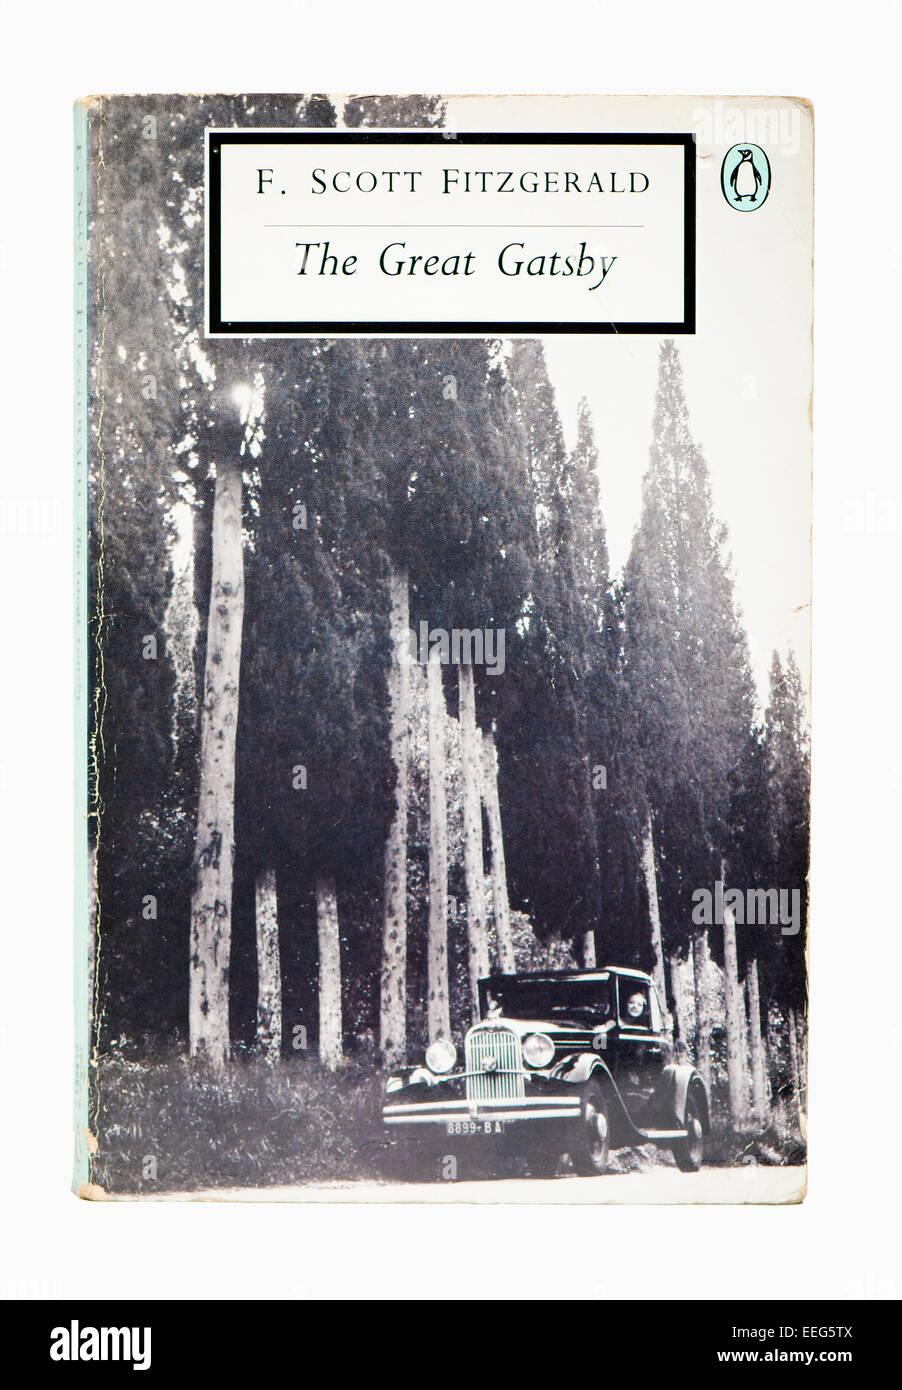 The Great Gatsby: Metaphor Analysis